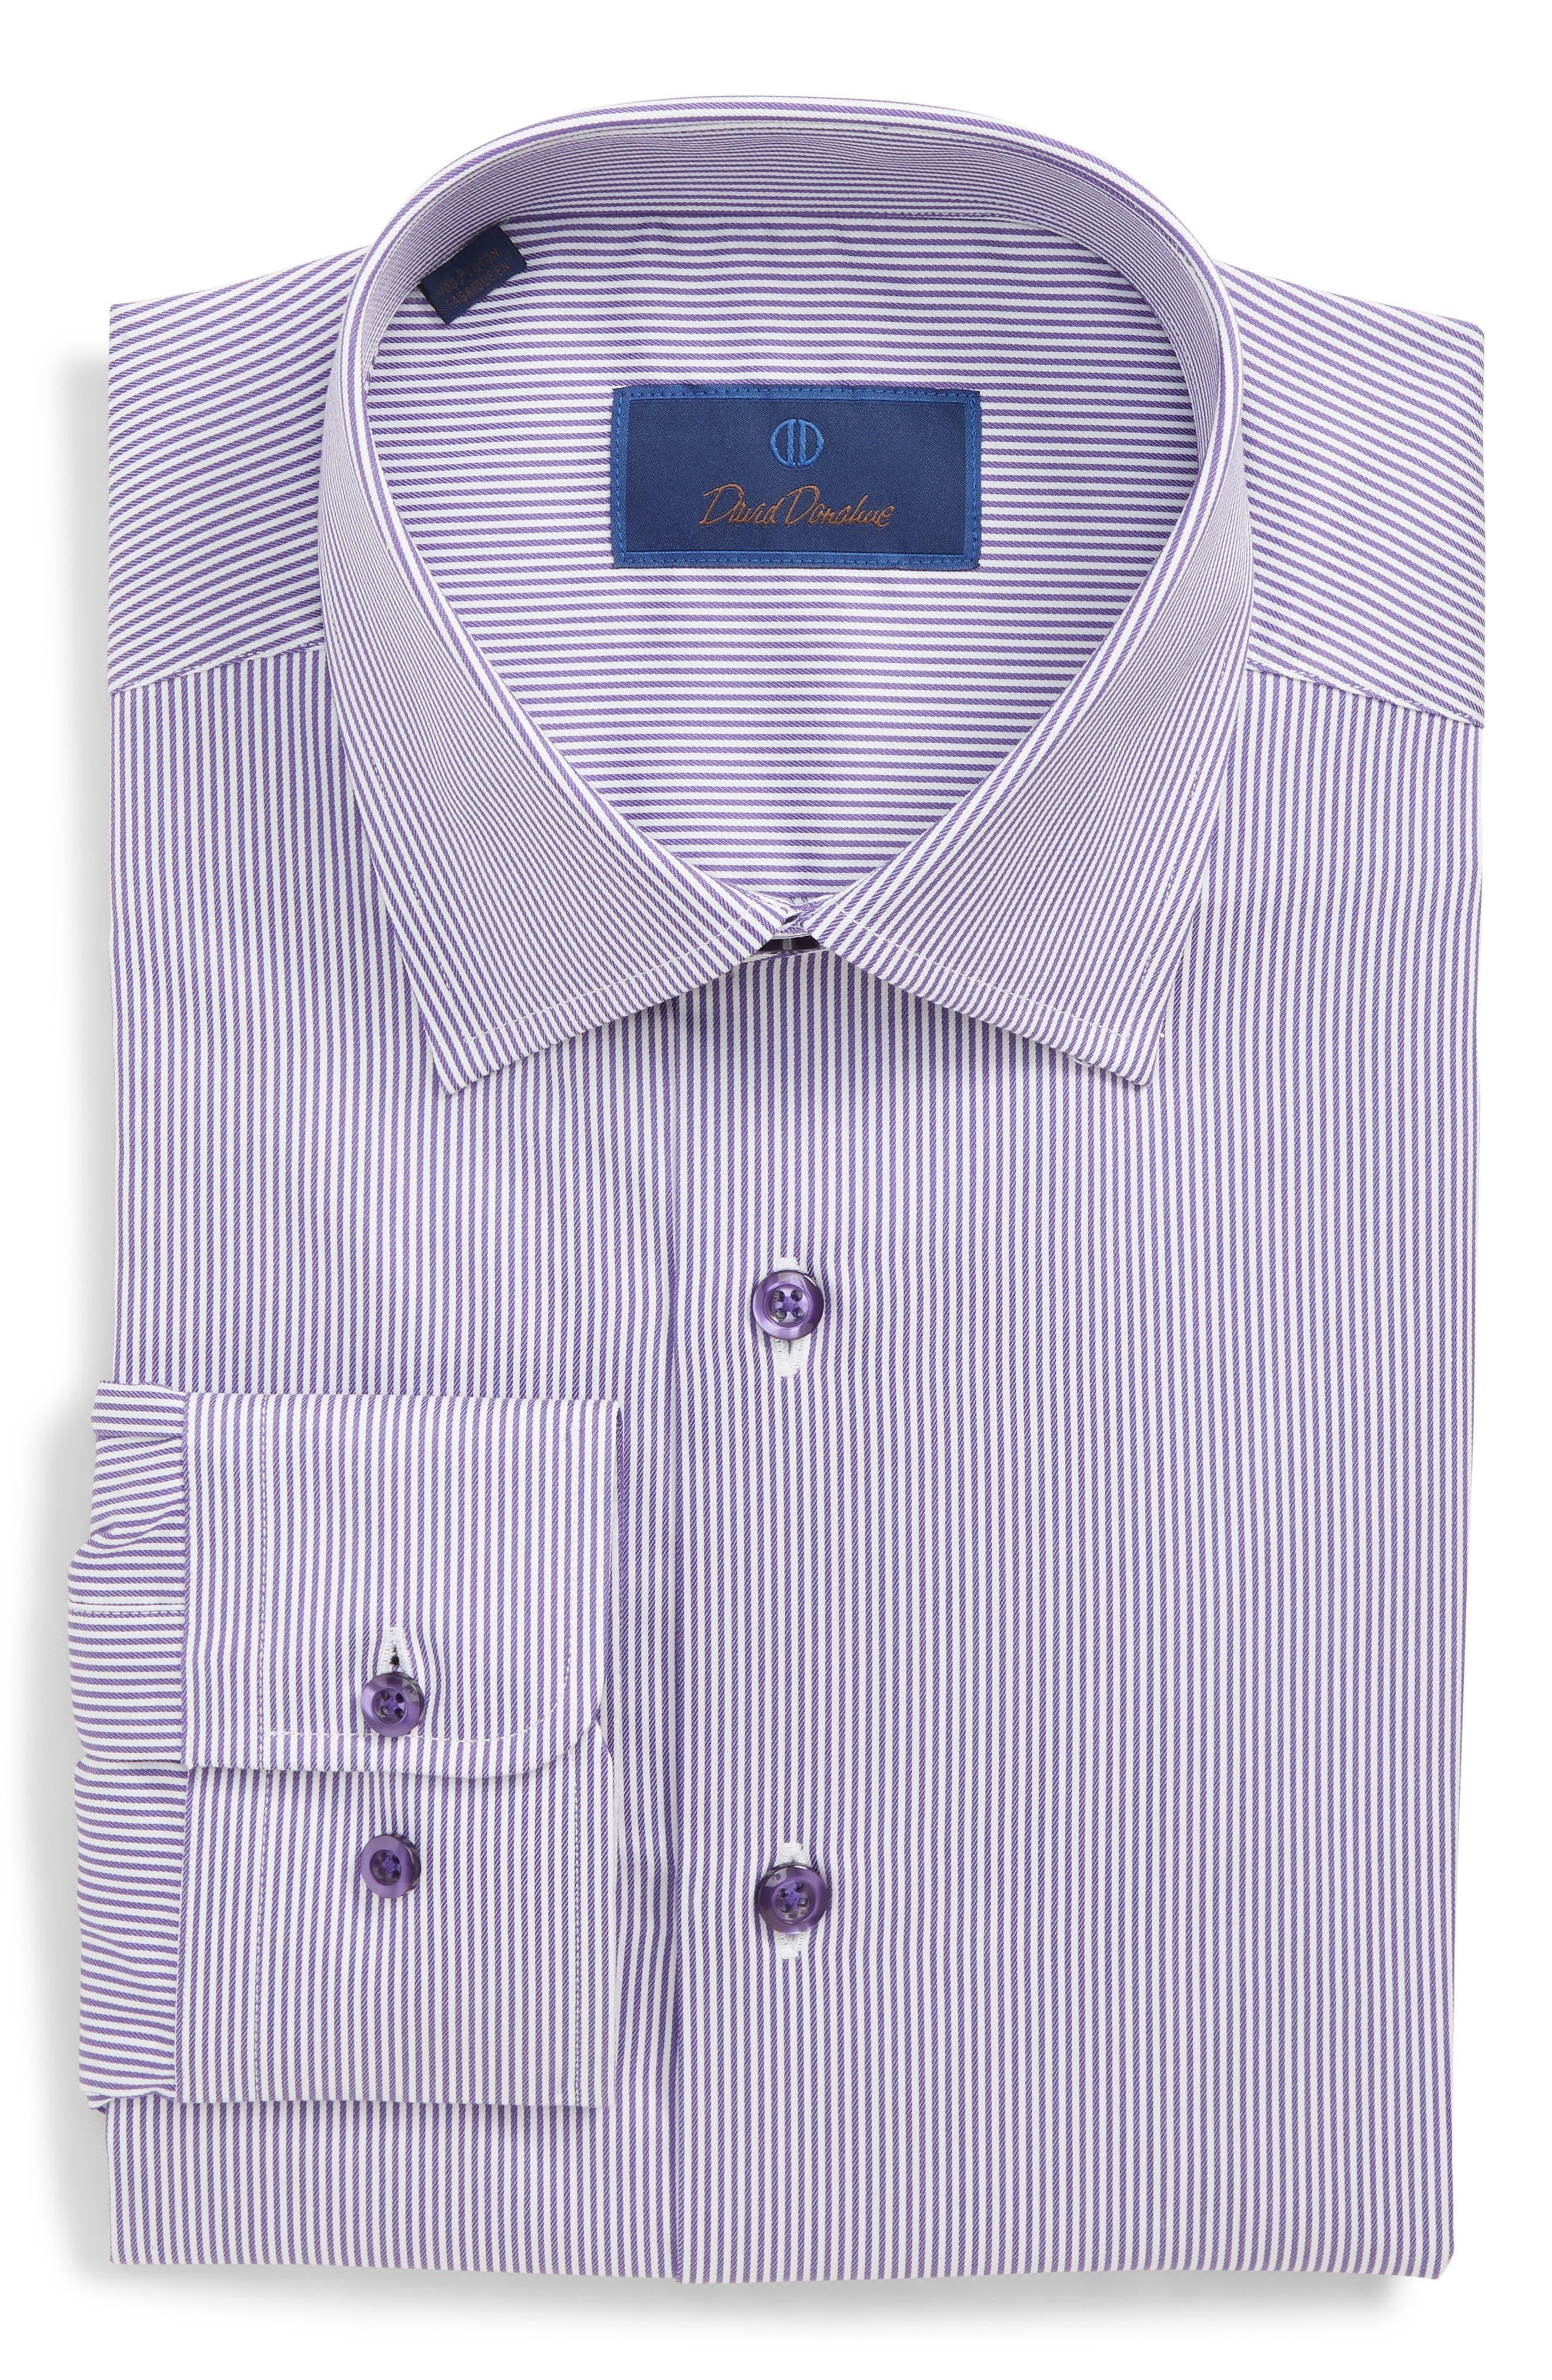 Regular Fit Stripe Dress Shirt,                             Main thumbnail 1, color,                             PURPLE